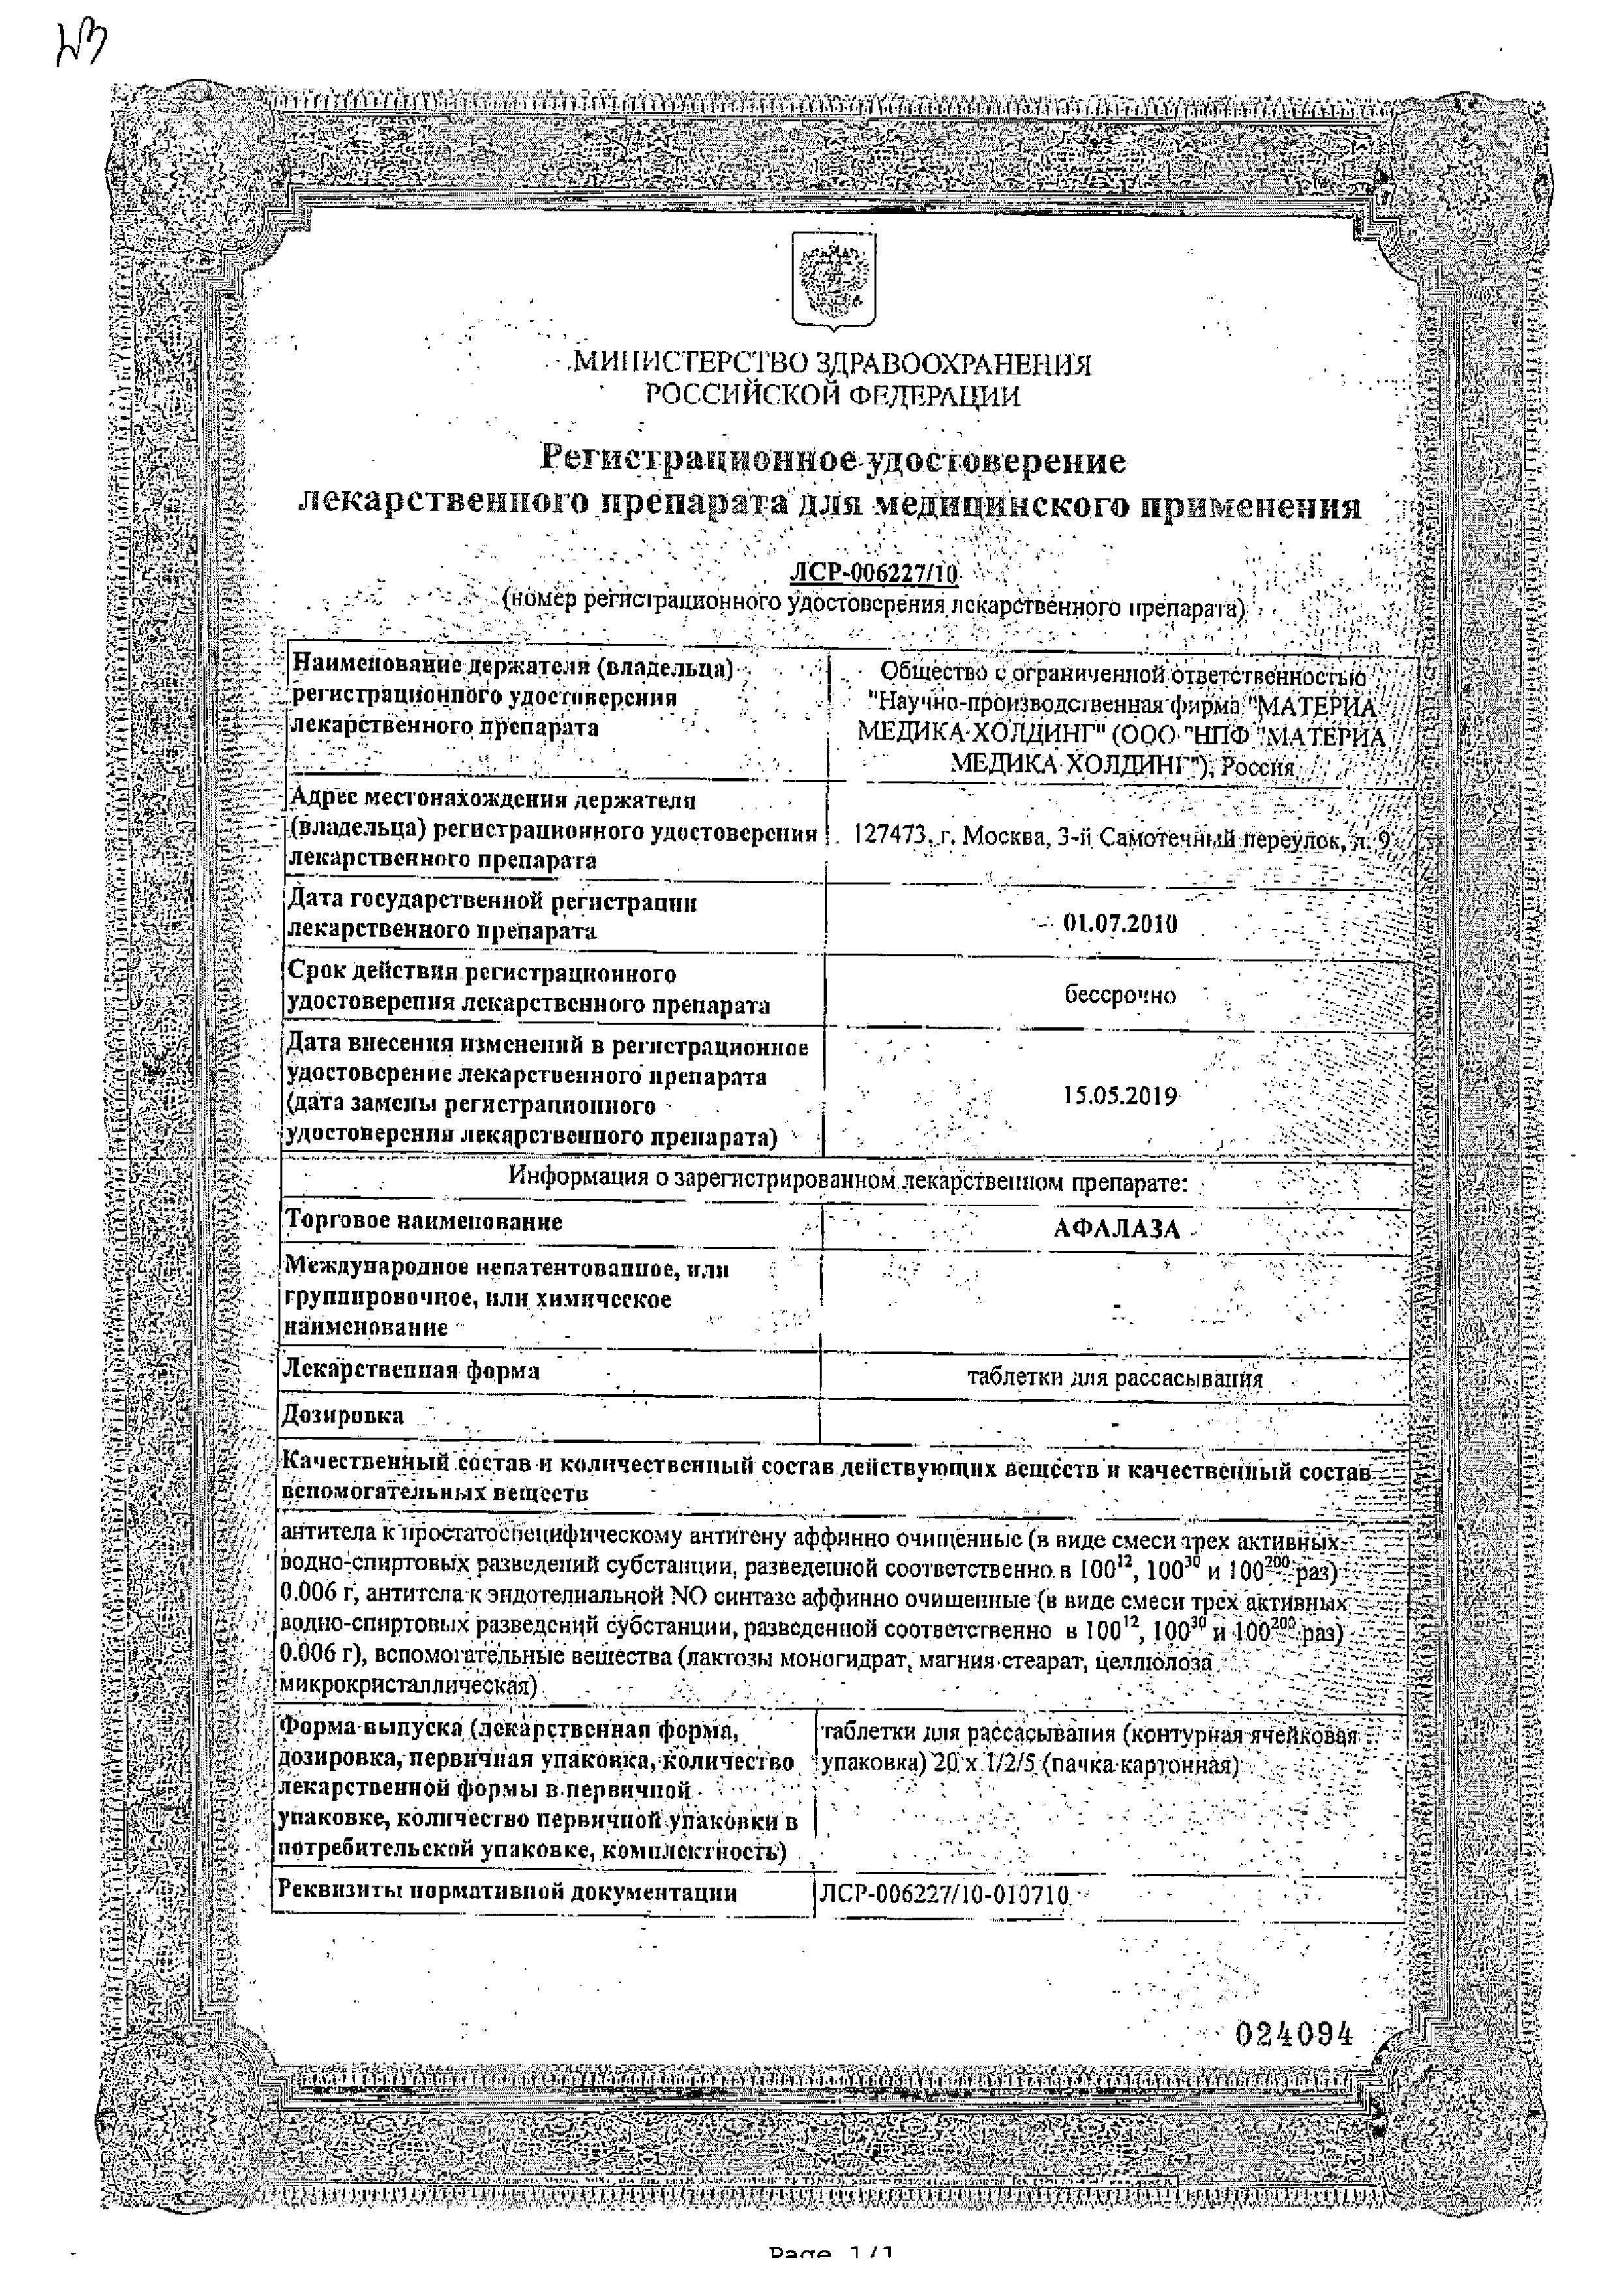 Афалаза сертификат